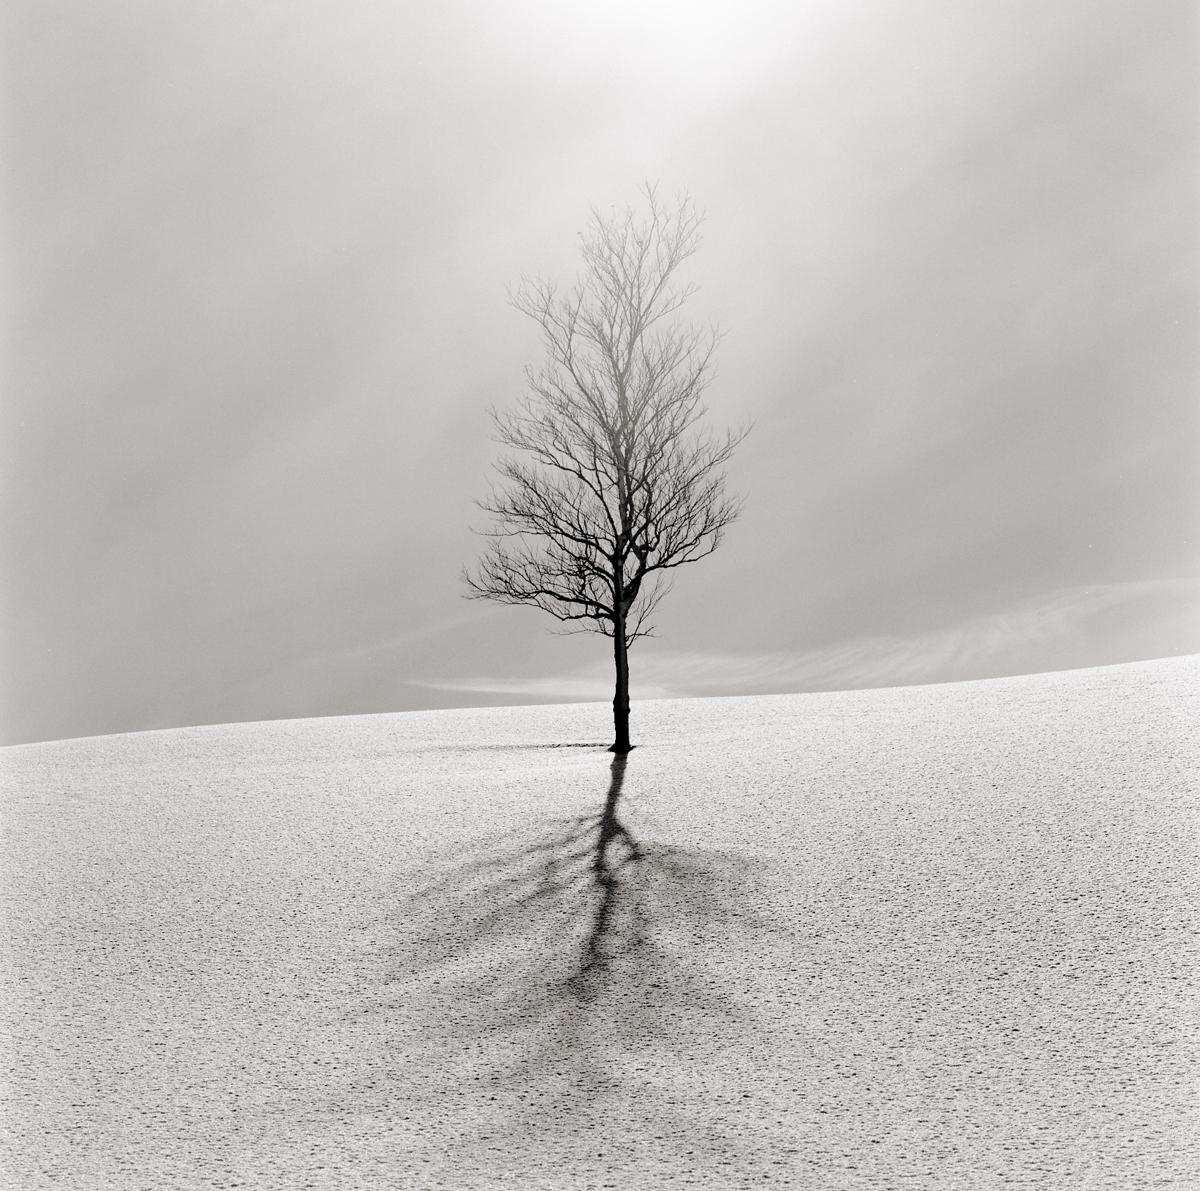 Snowy landscape by Tomoharu Ota